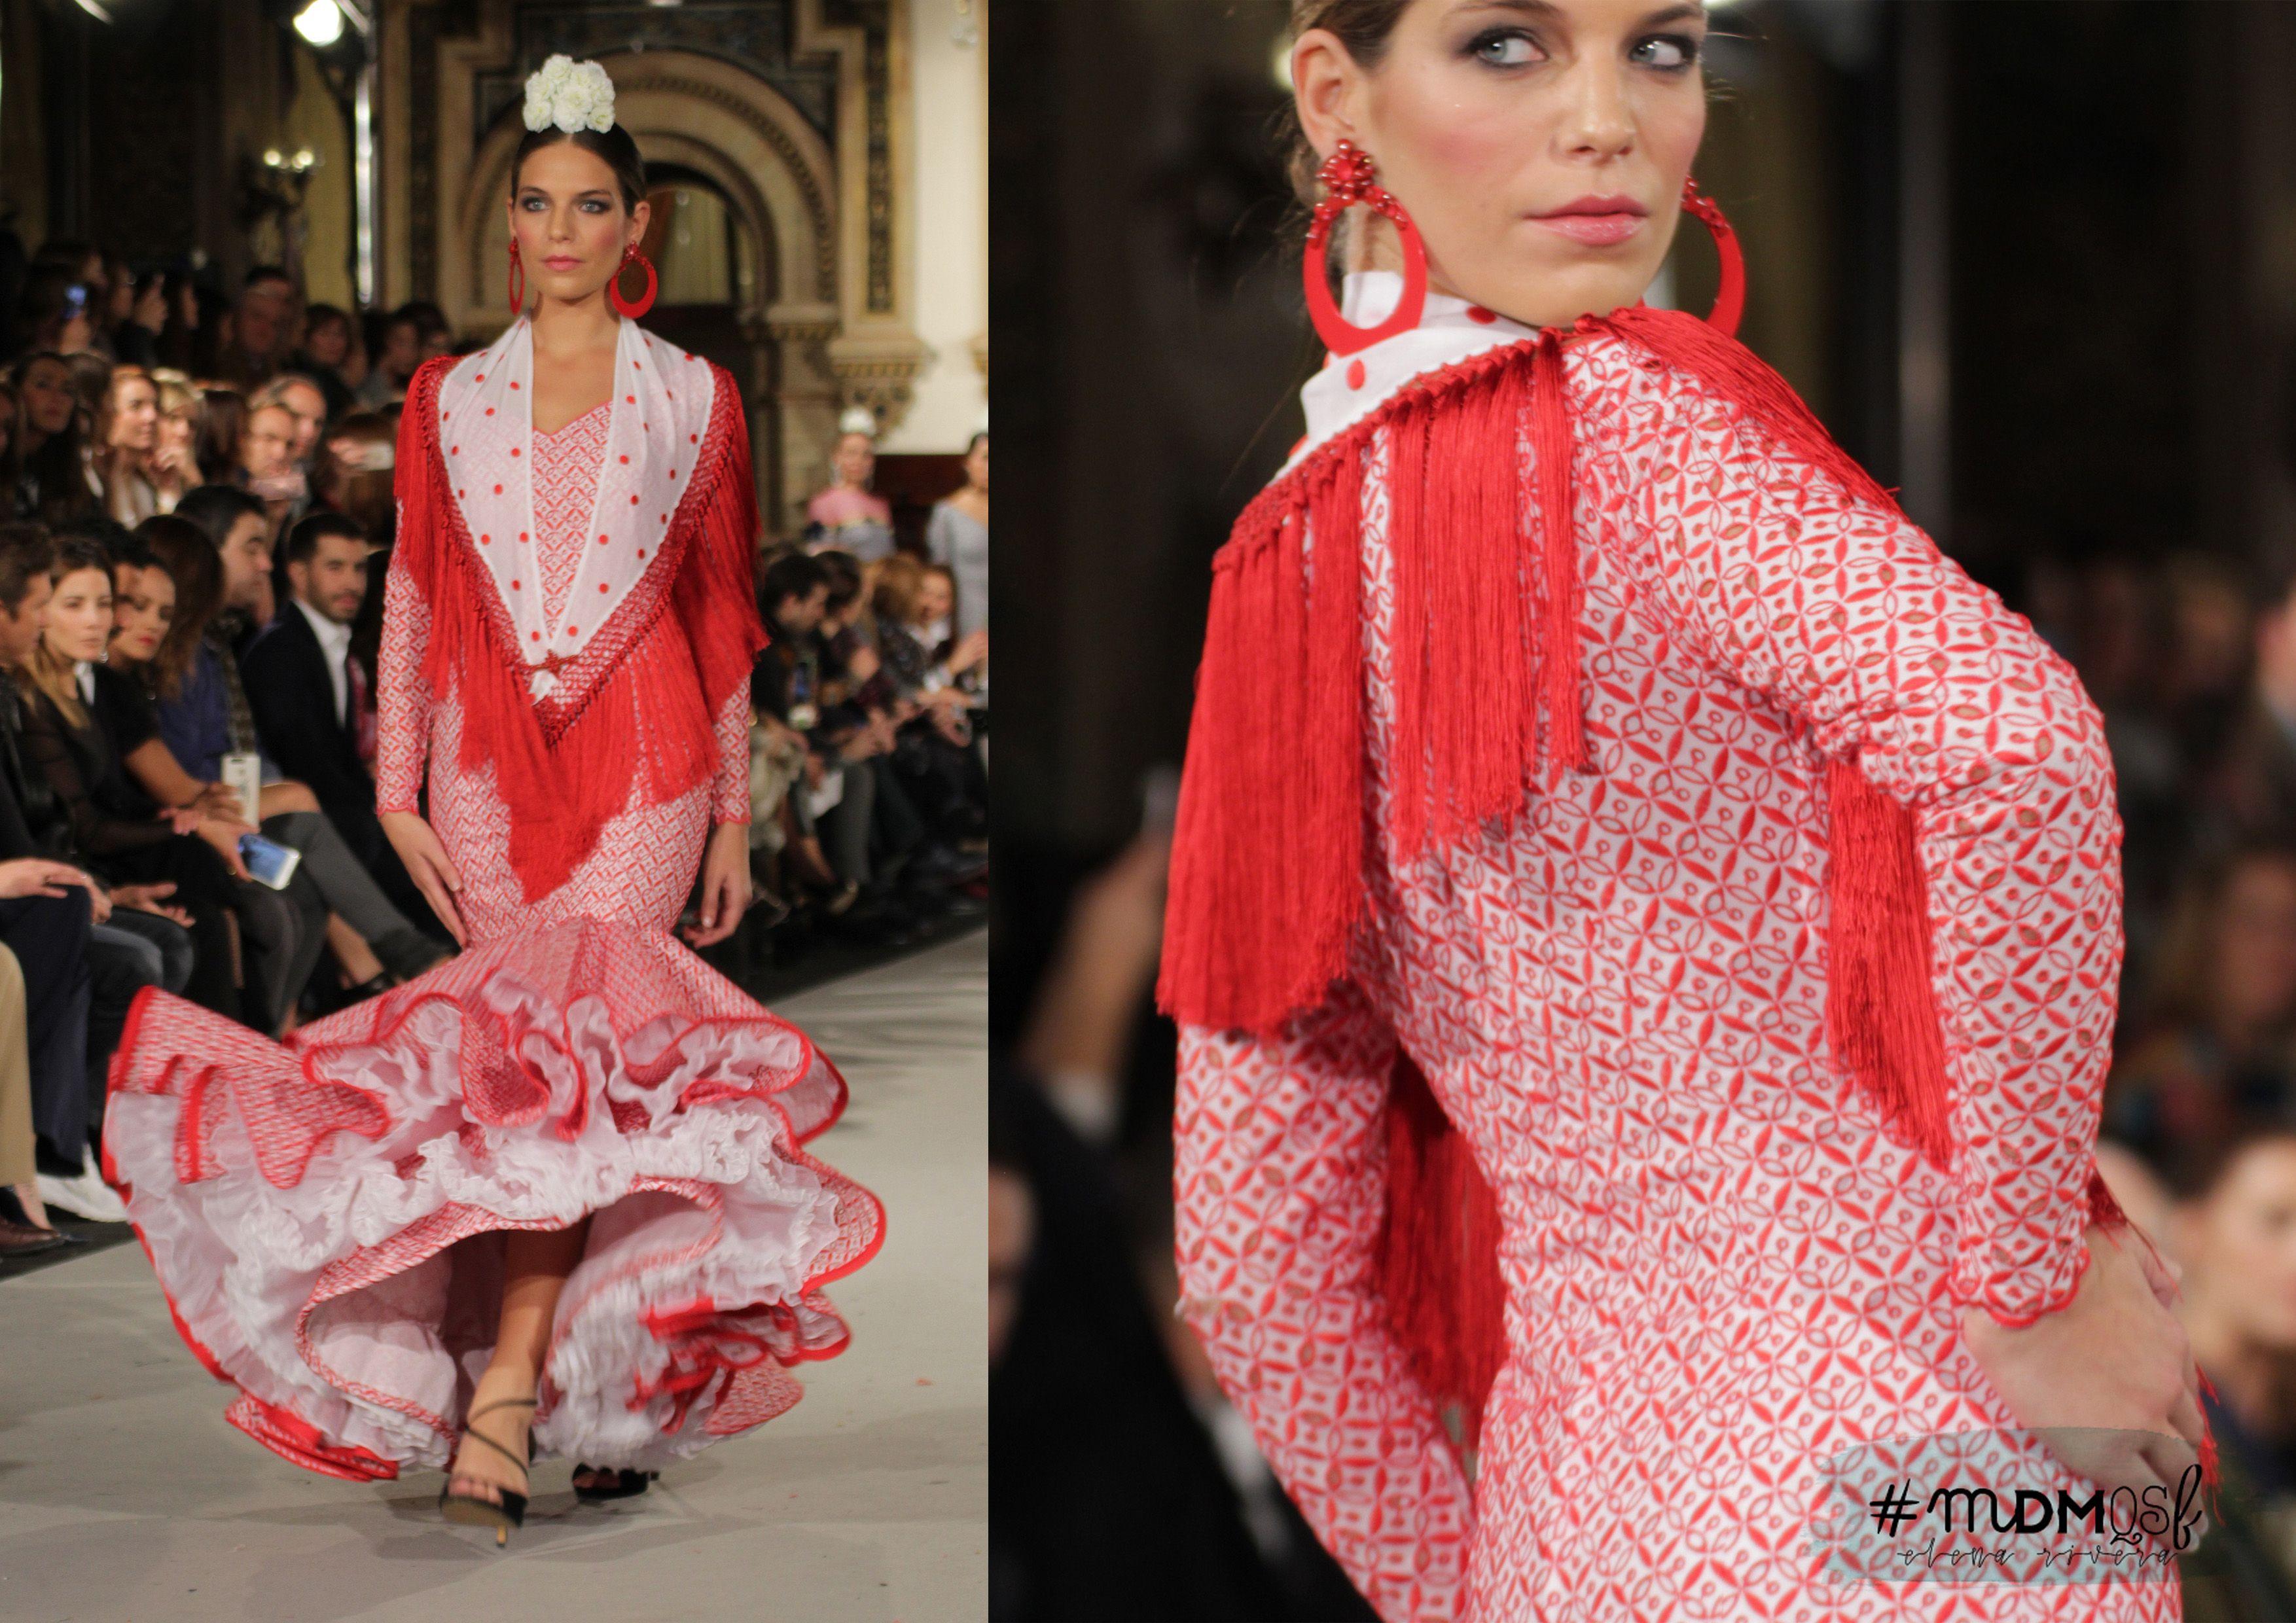 Flamenca 2018 - José Hidalgo. Colección de moda flamenca